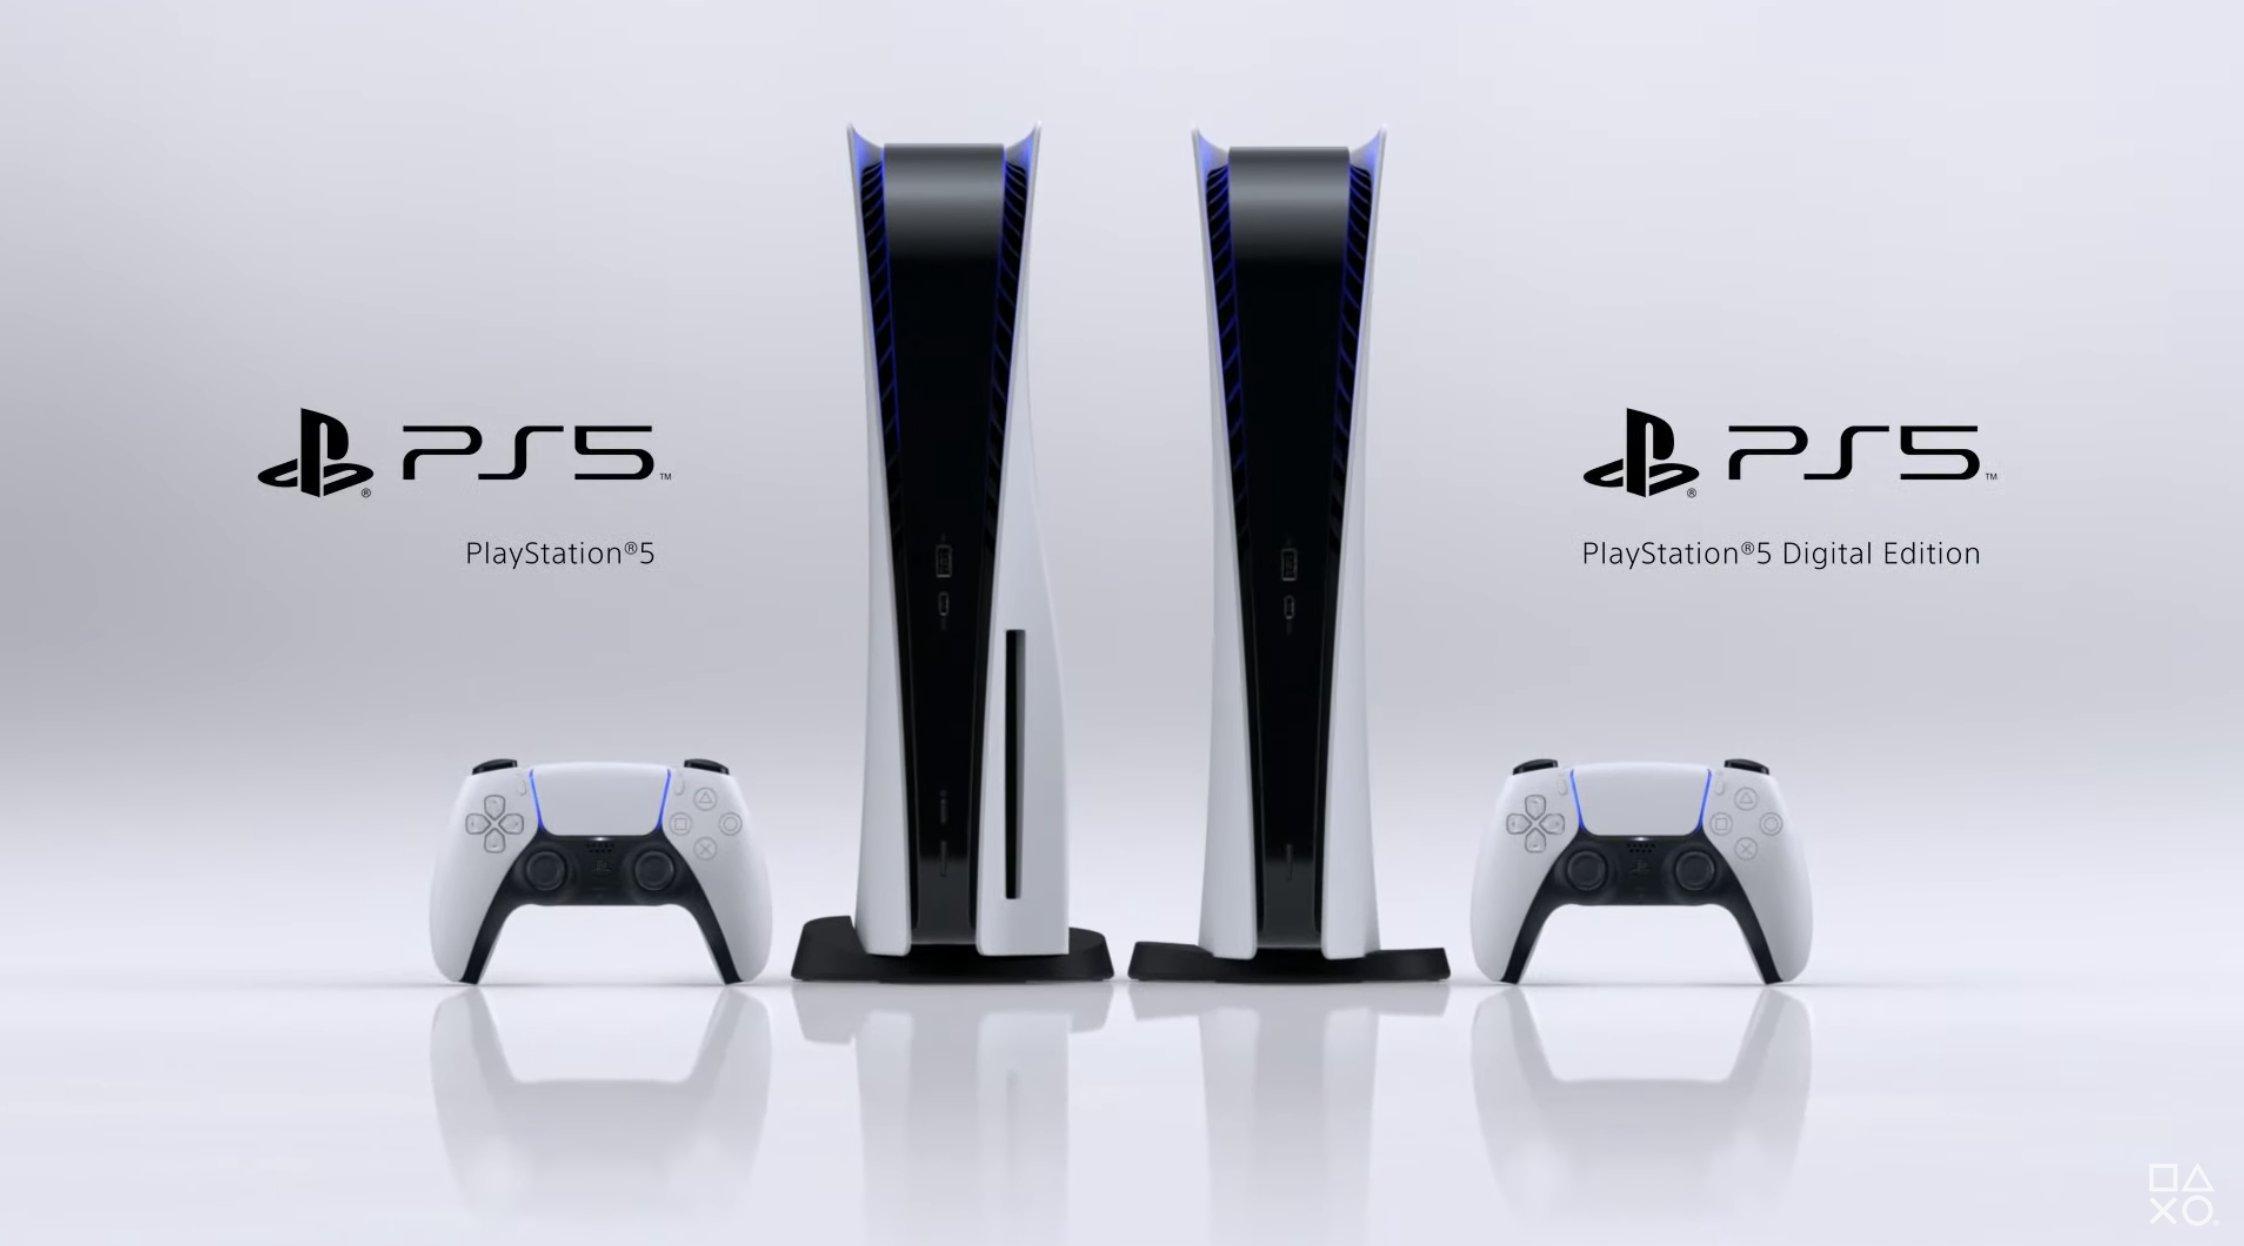 Os novos consoles do Playstation